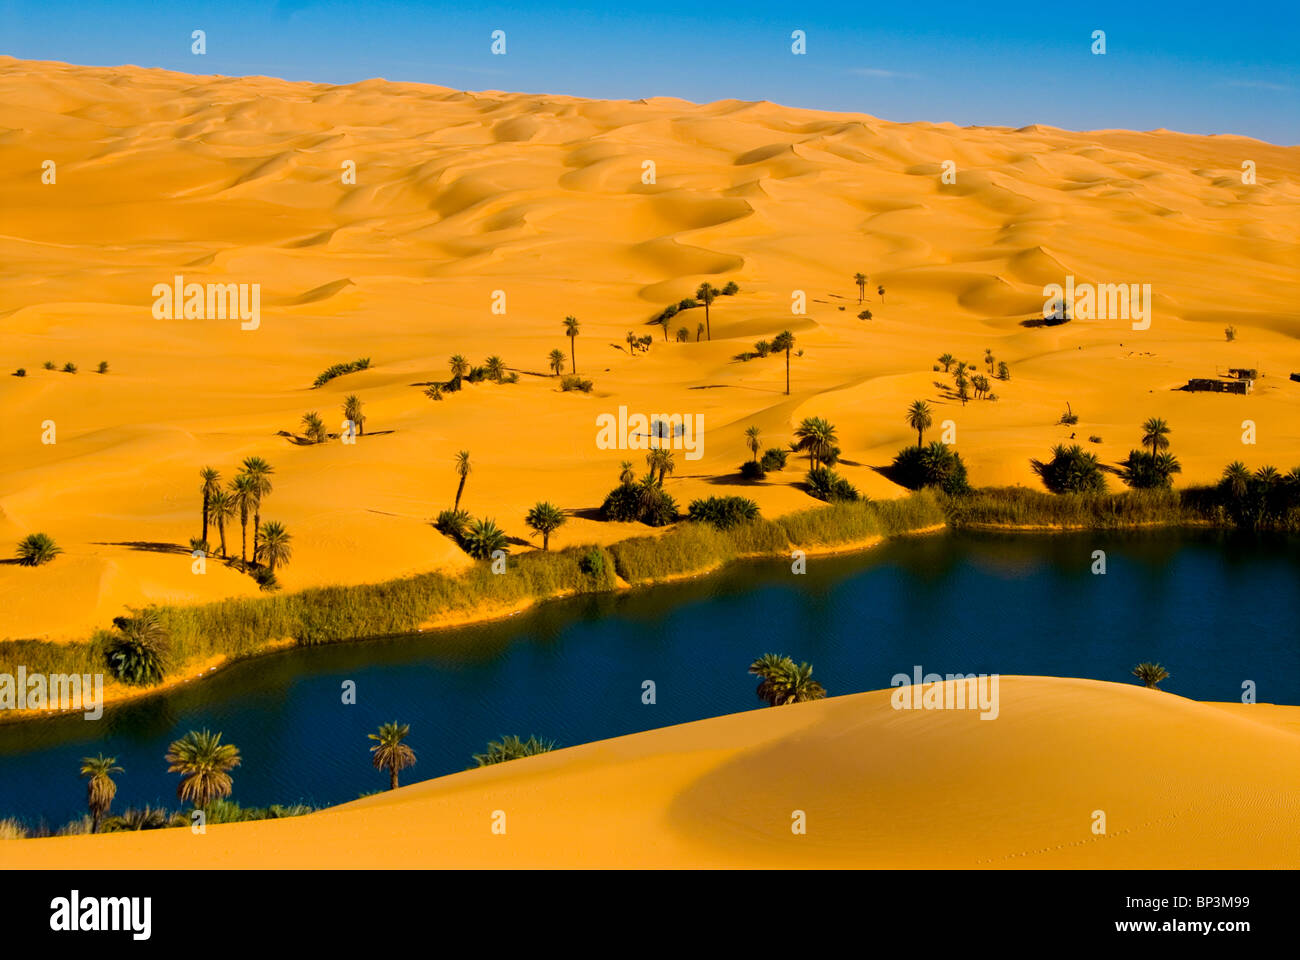 ubari libya